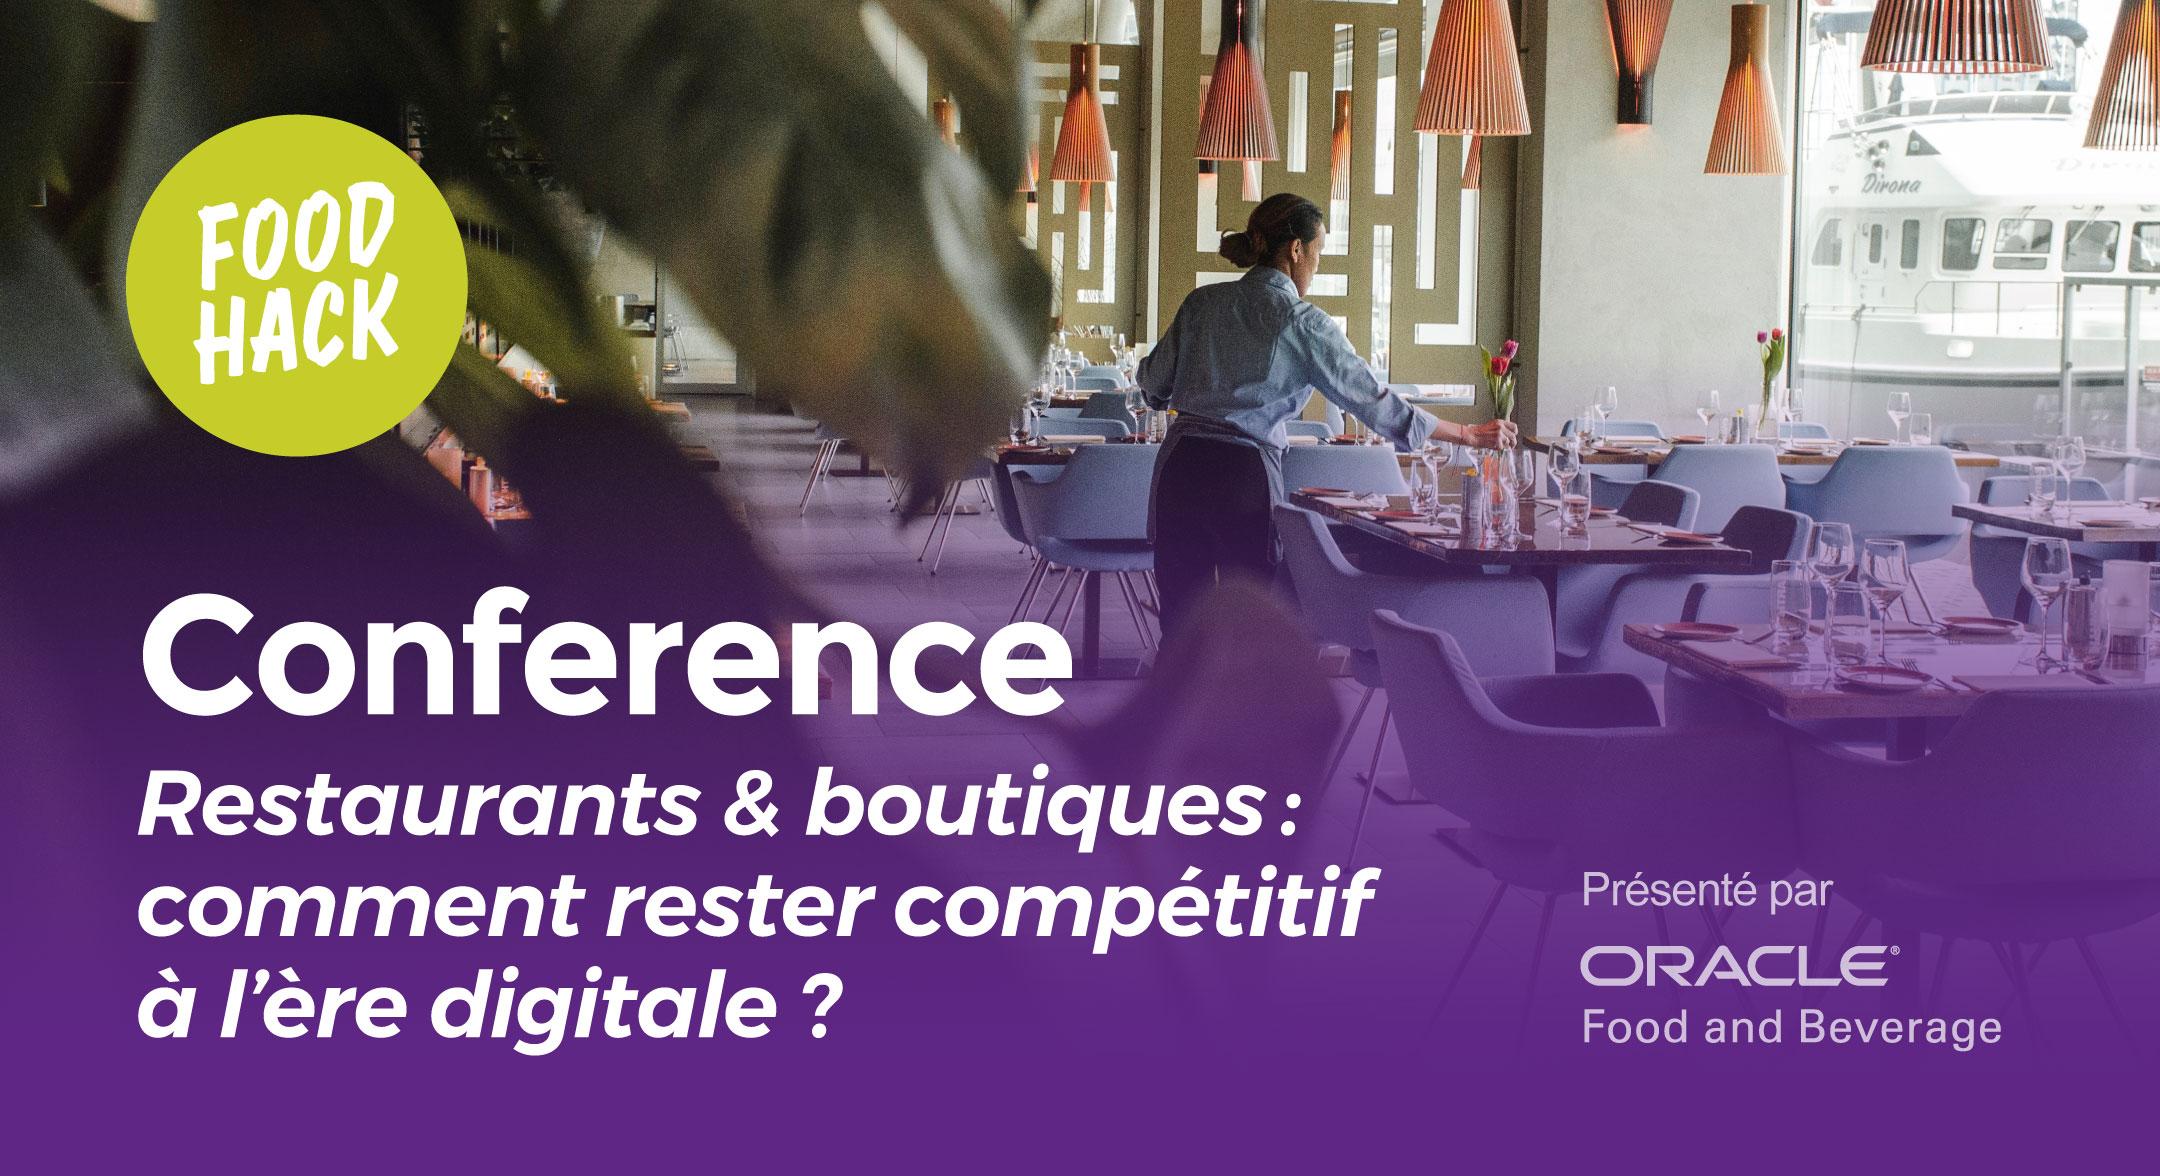 FoodHack-Oracle-Conference-Banner-3.jpg